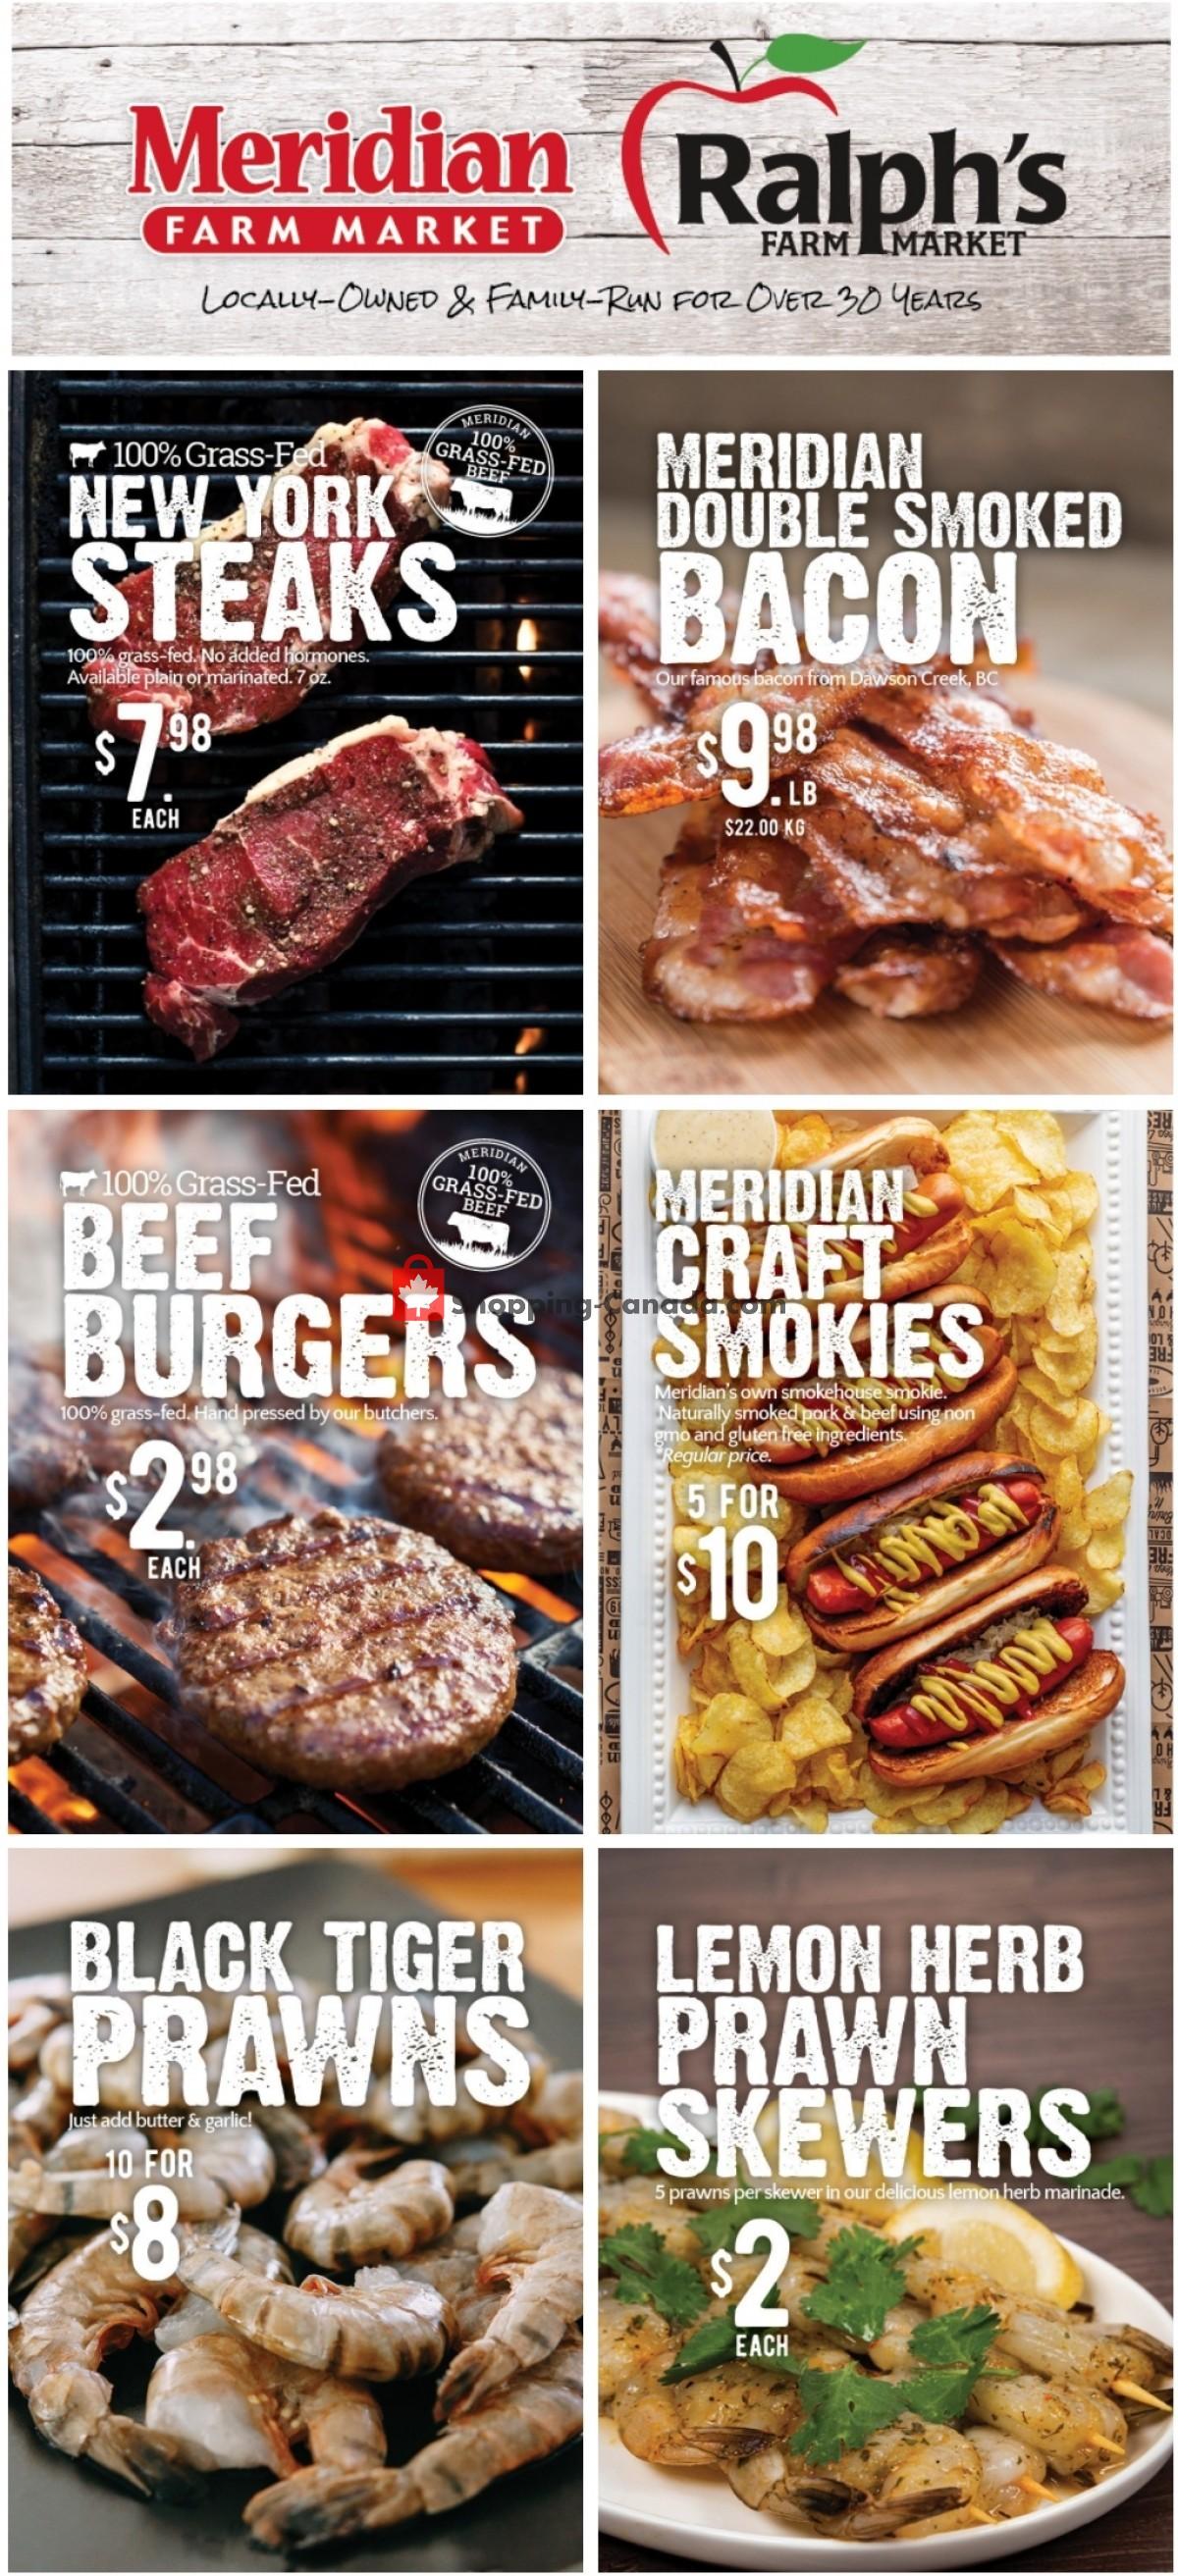 Flyer Meridian Meats & Meridian Farm Market Canada - from Thursday September 2, 2021 to Wednesday September 8, 2021